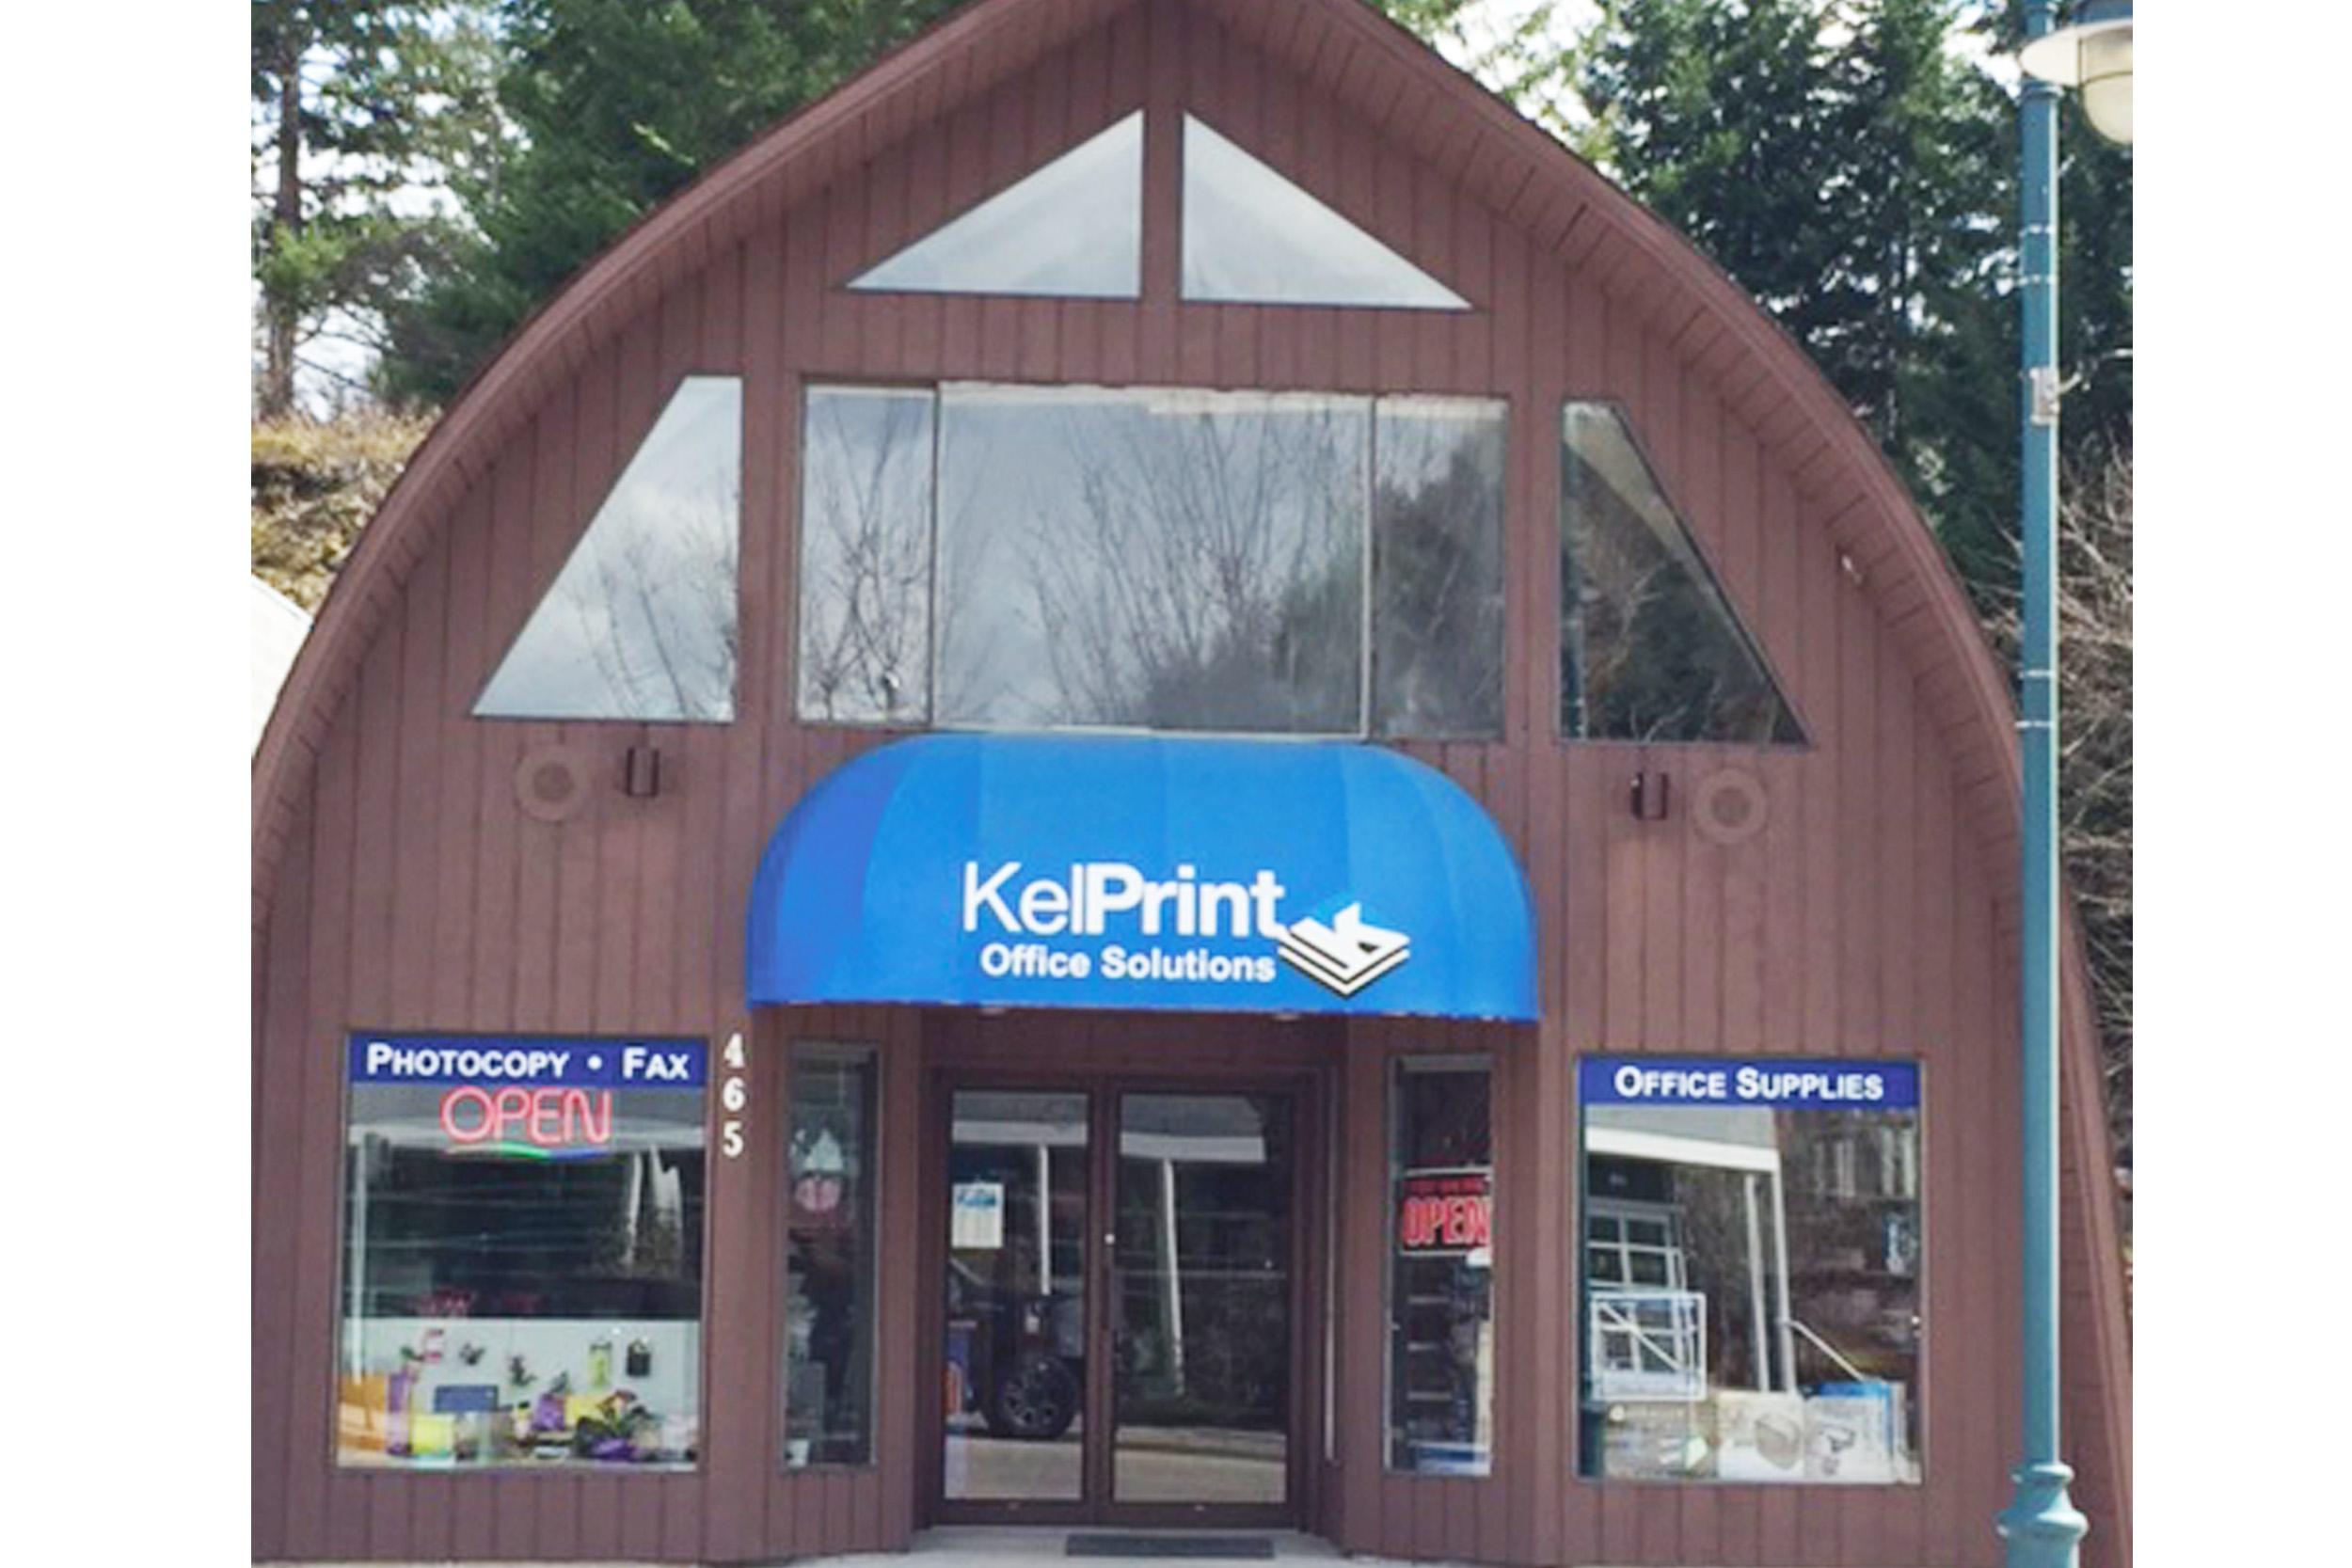 exterior building for Kel Print